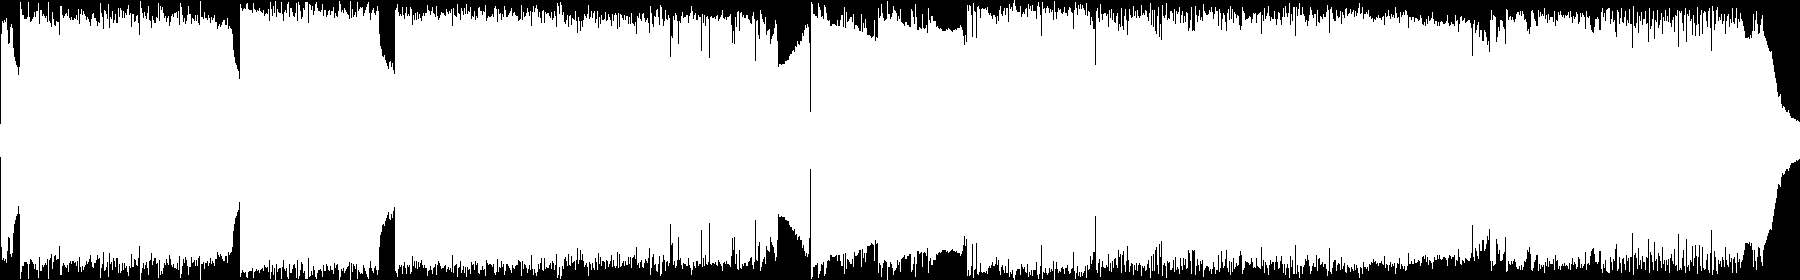 Tunecraft Lush Chords for Cthulhu audio waveform